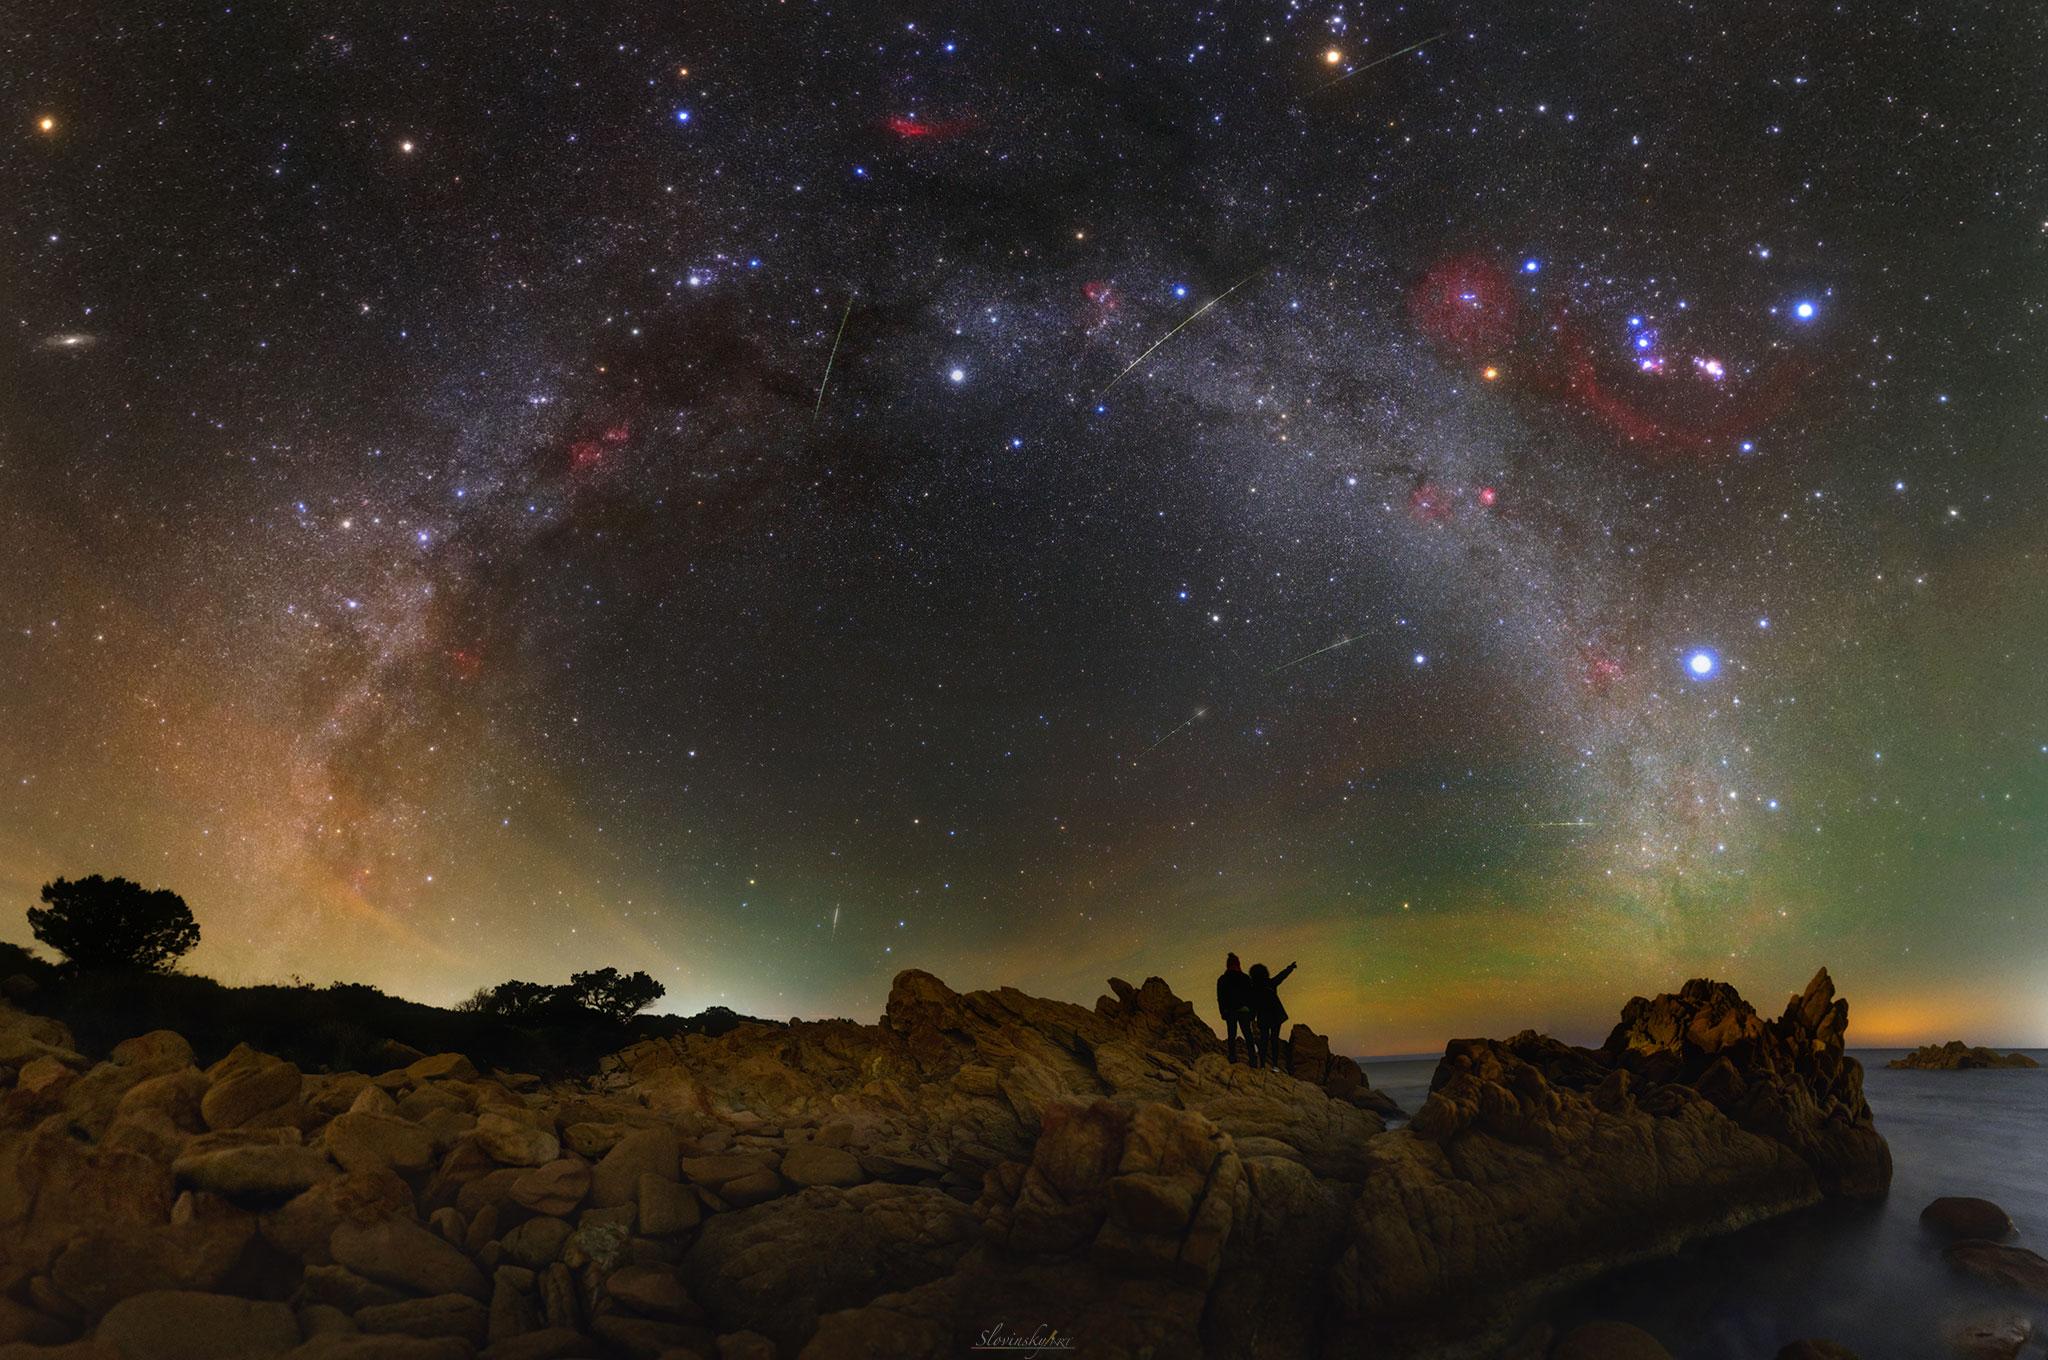 APOD: 2020 October 21 - A Night Sky Vista from Sardinia